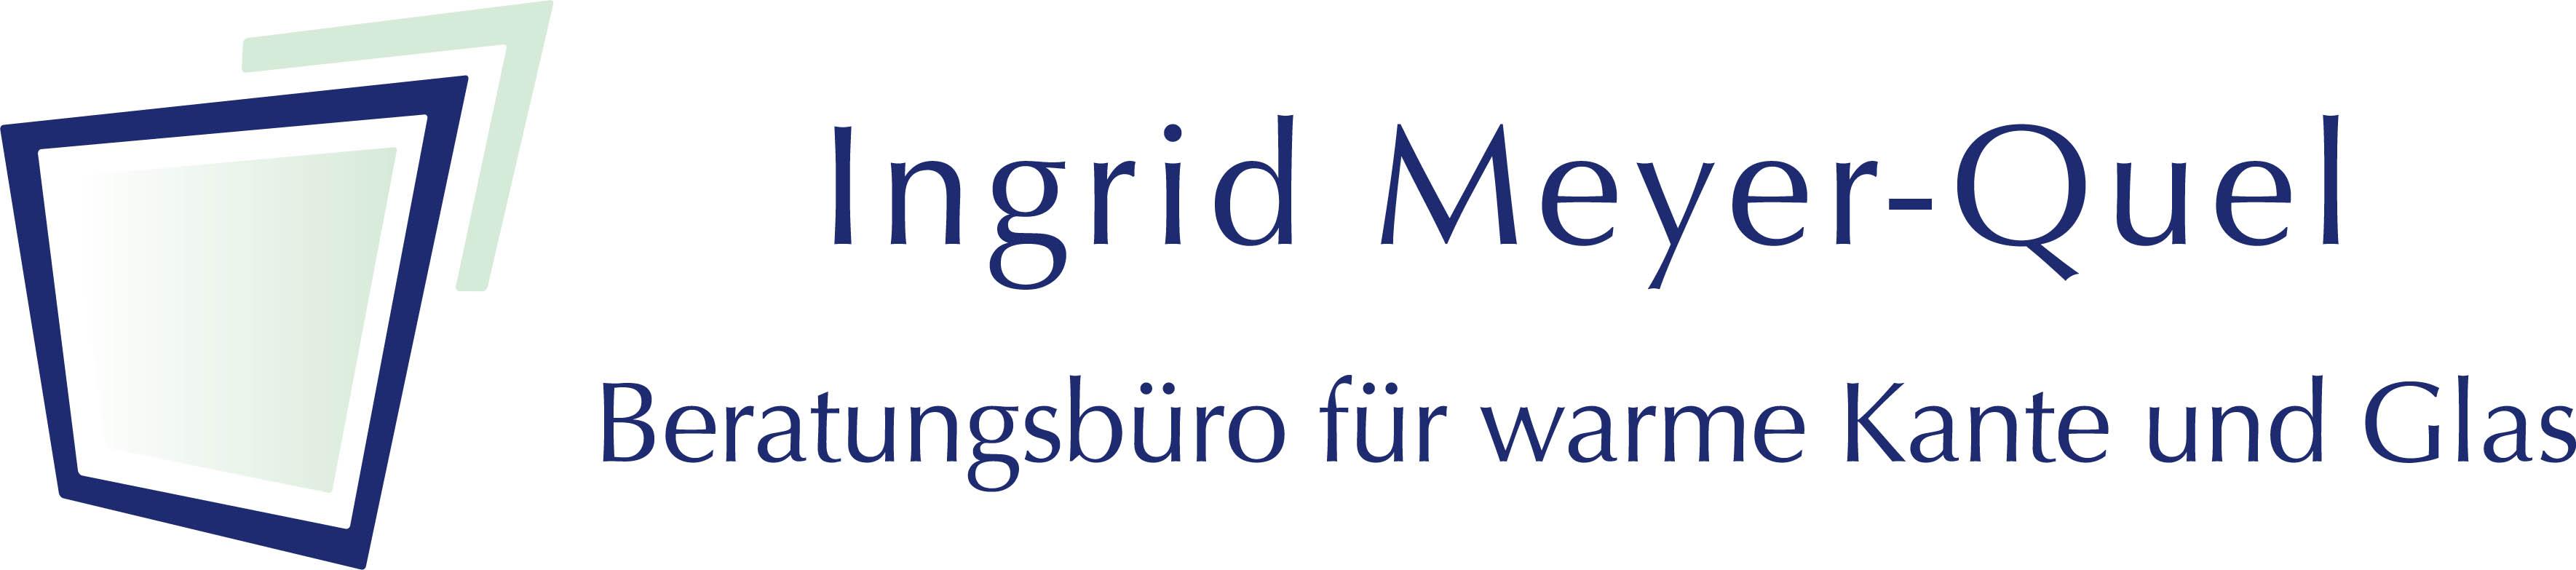 Ingrid Meyer-Quel